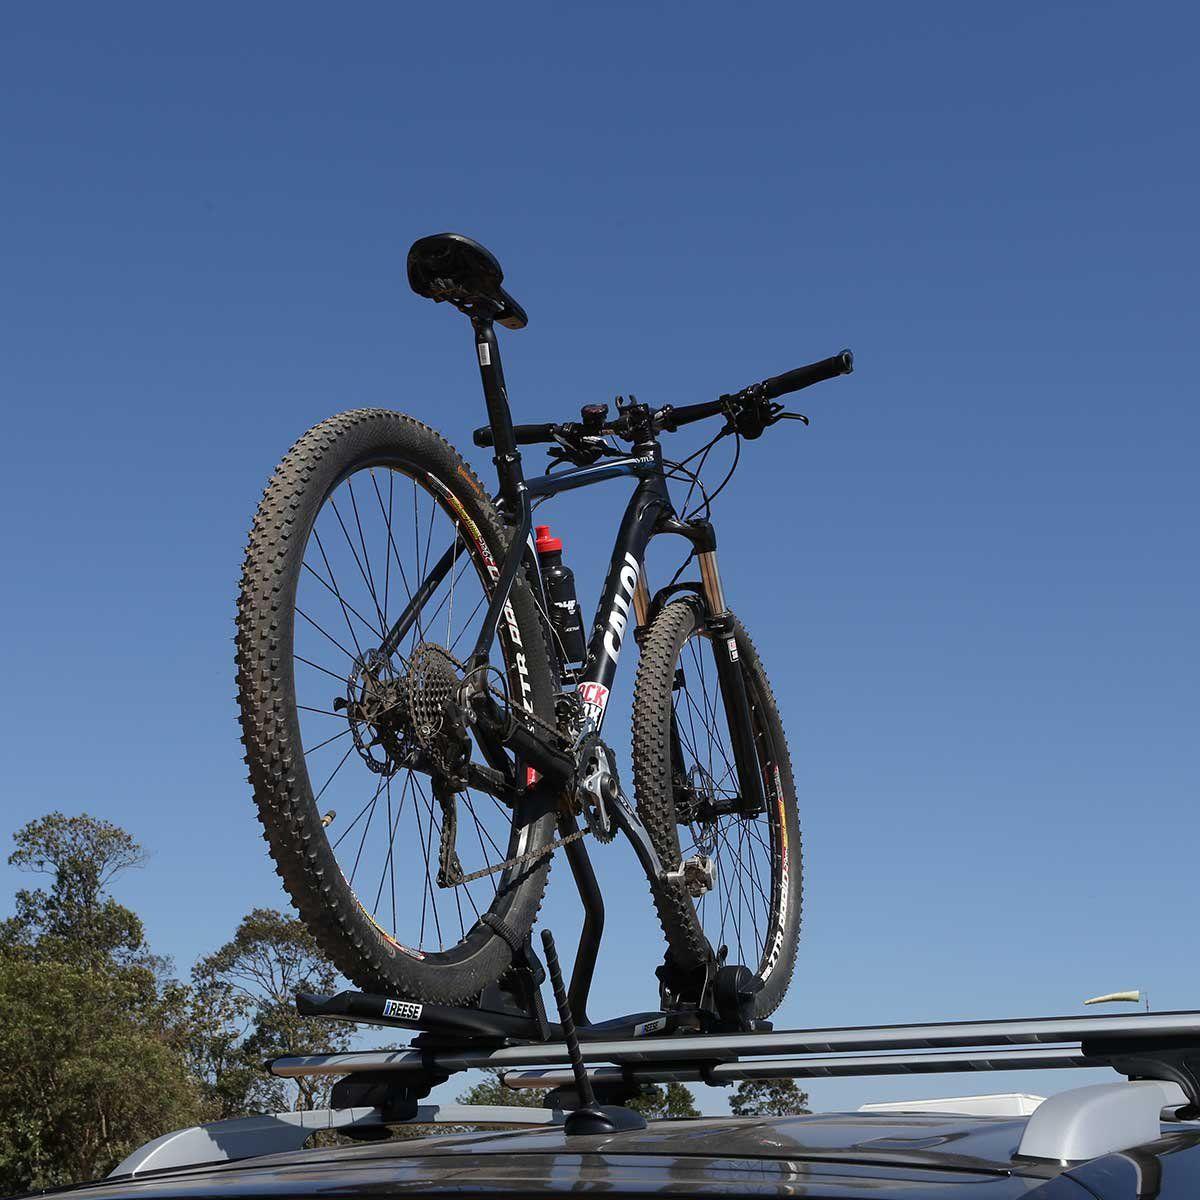 Suporte De Teto Para Bicicleta Transbike Preto Reese